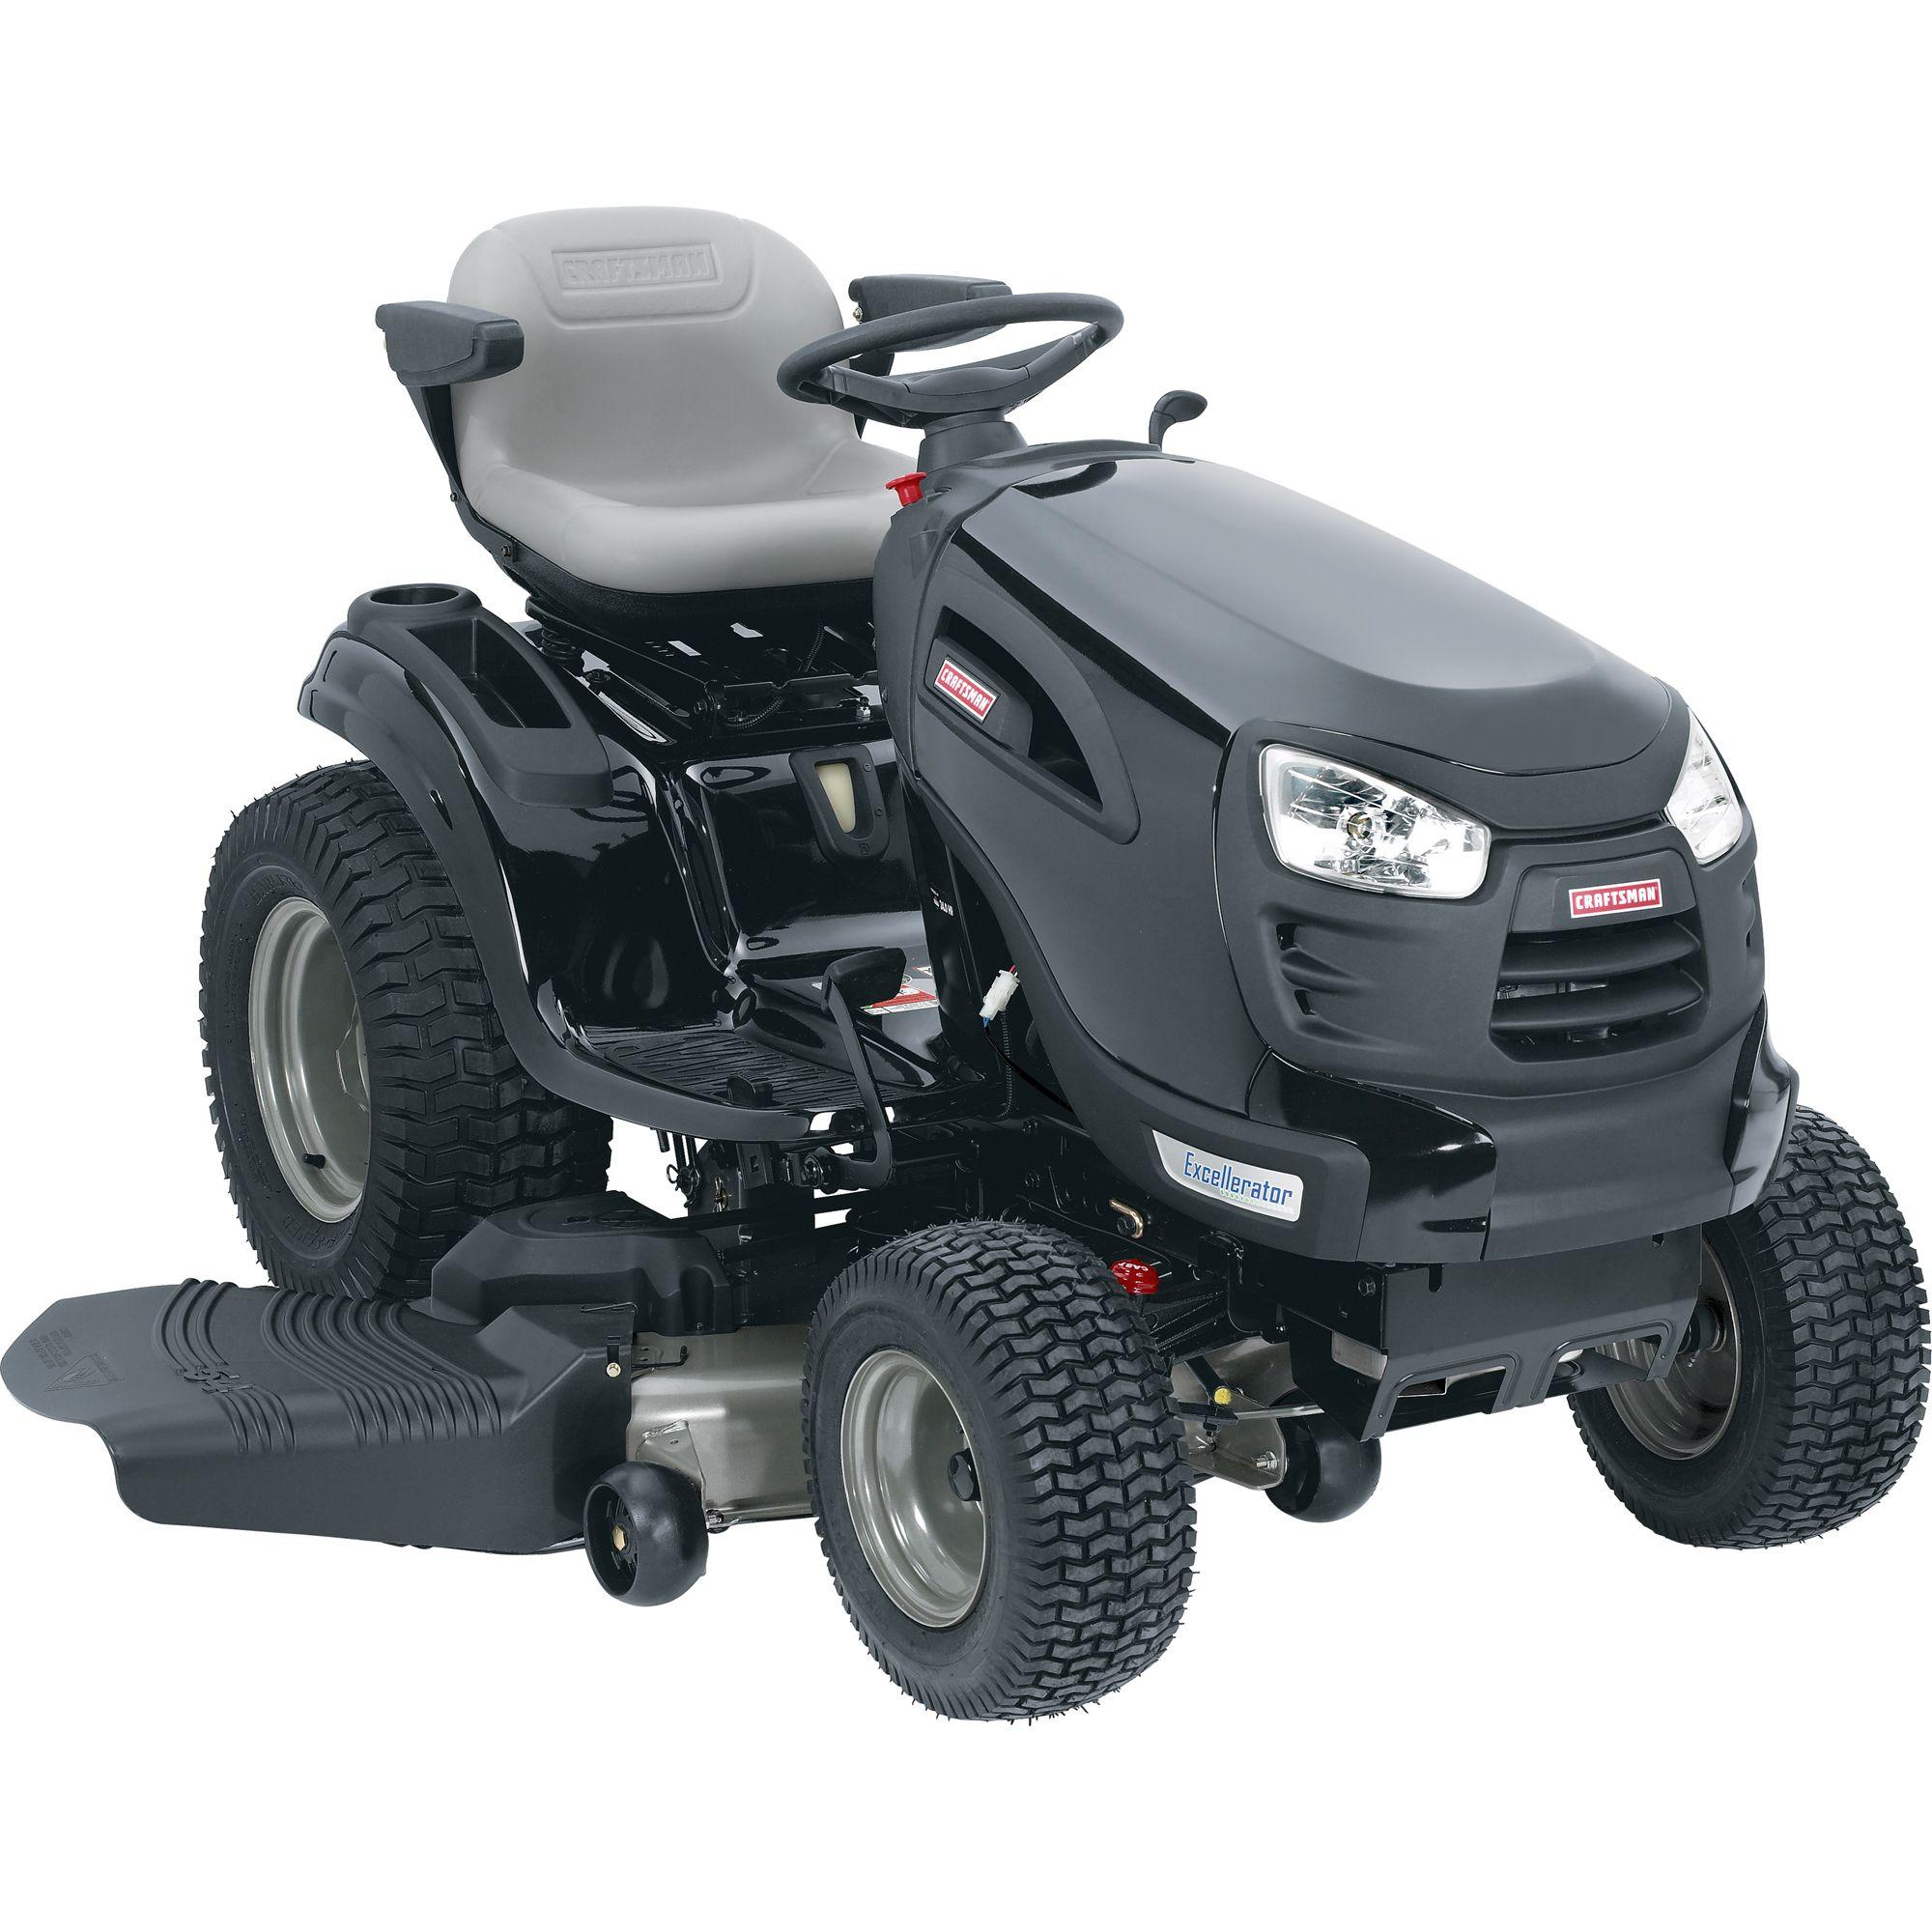 medium resolution of craftsman 28947 gt 5000 54 kohler 26 hp gas powered riding garden craftsman gt5000 wiring harness